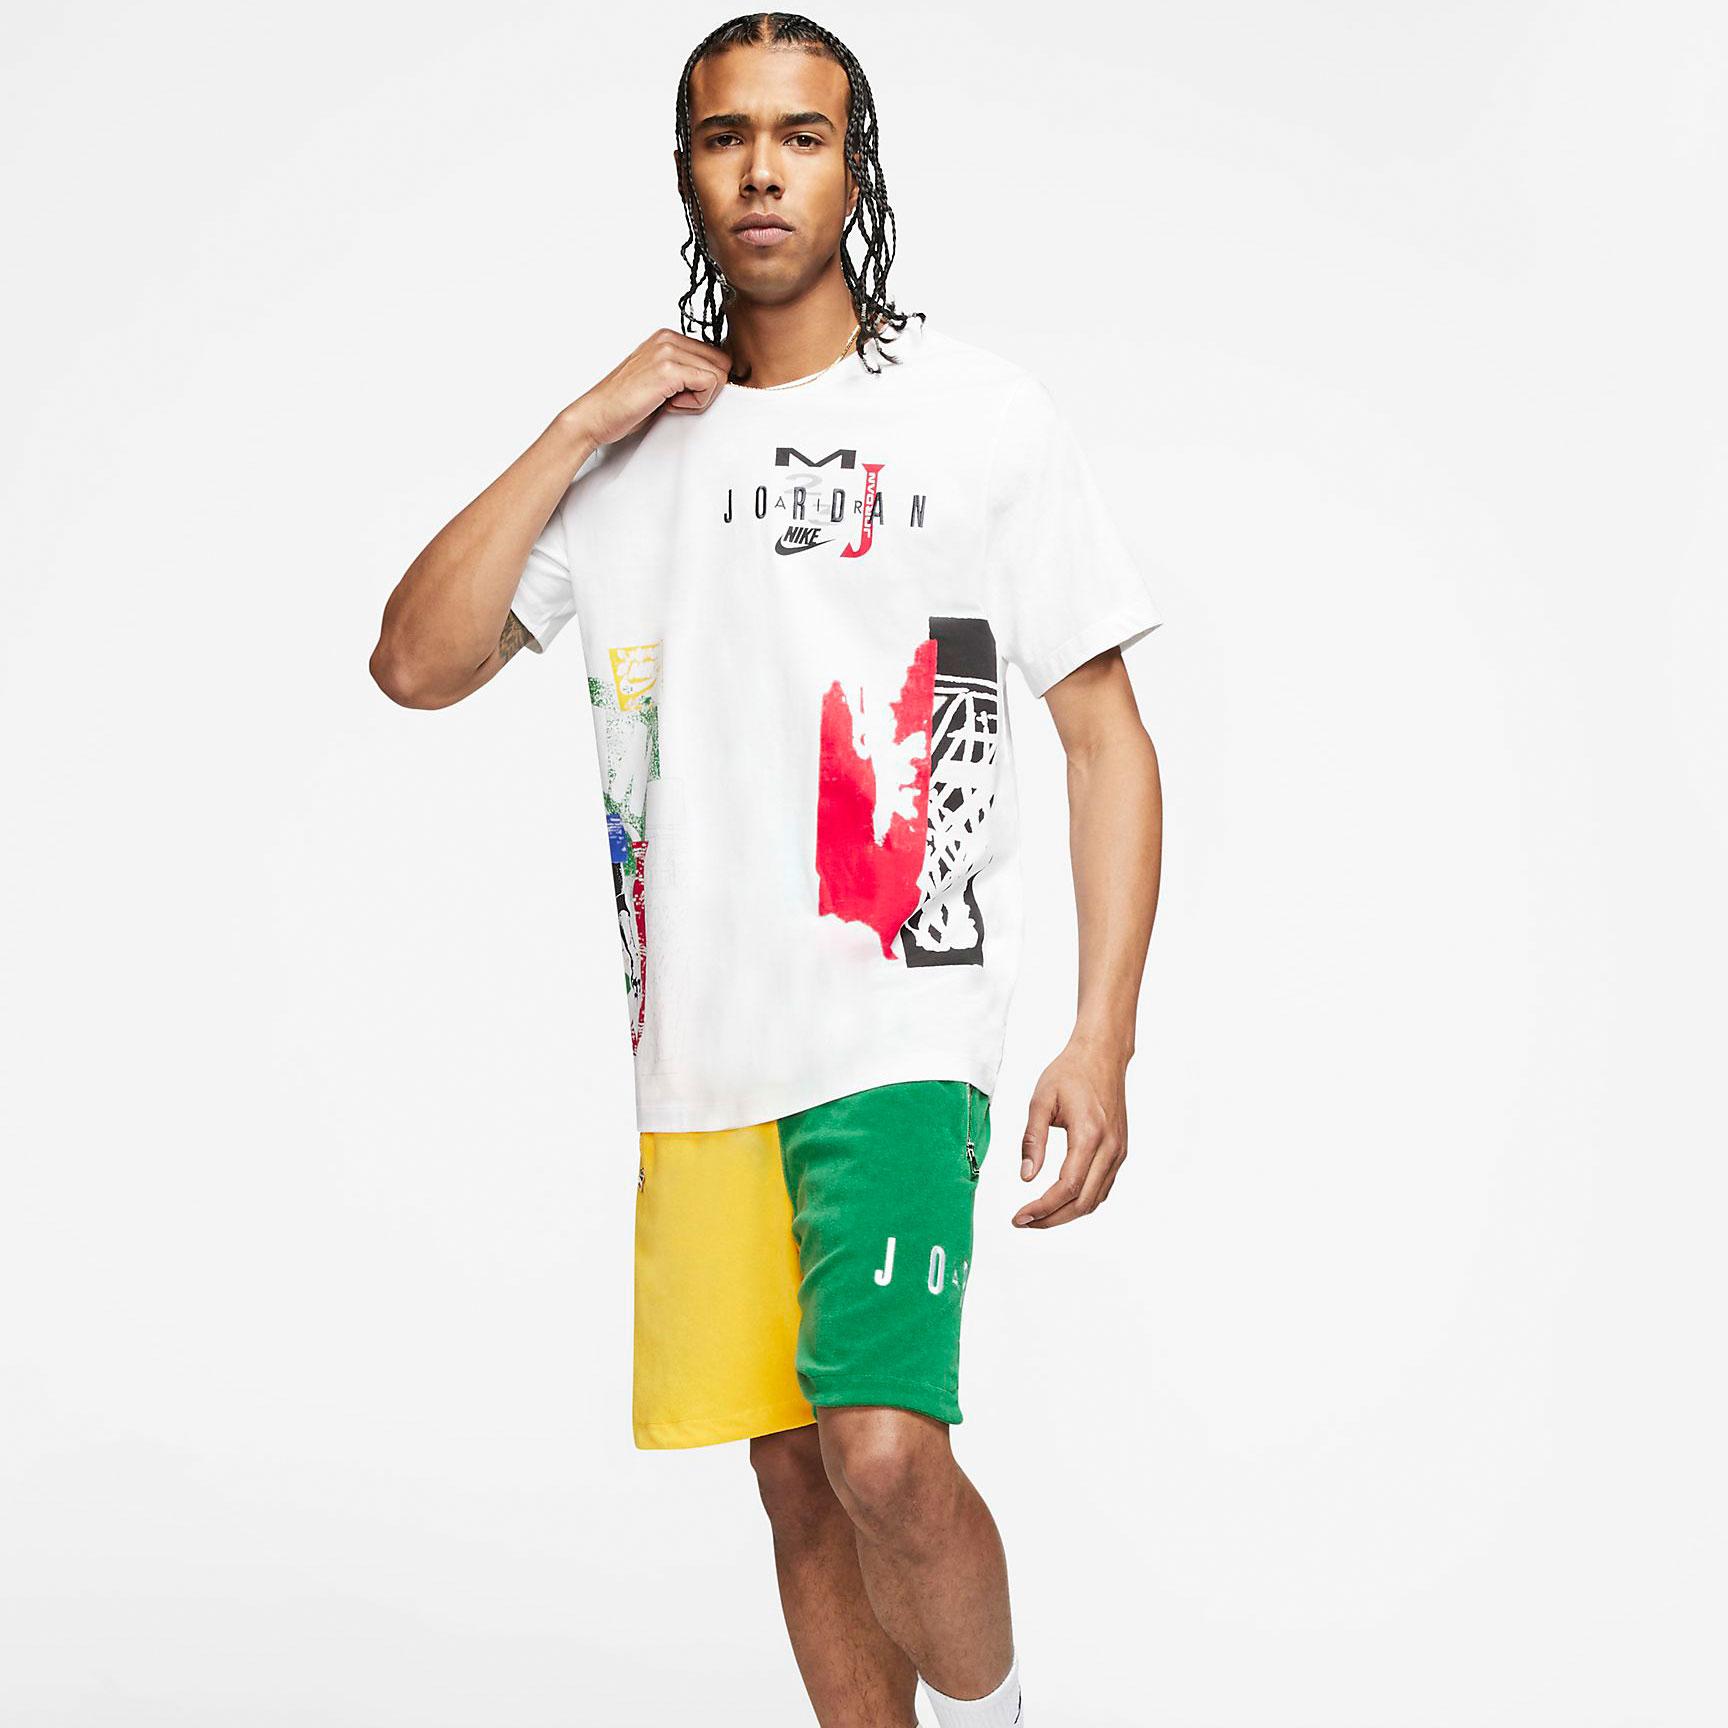 hare-jordan-6-shirt-shorts-match